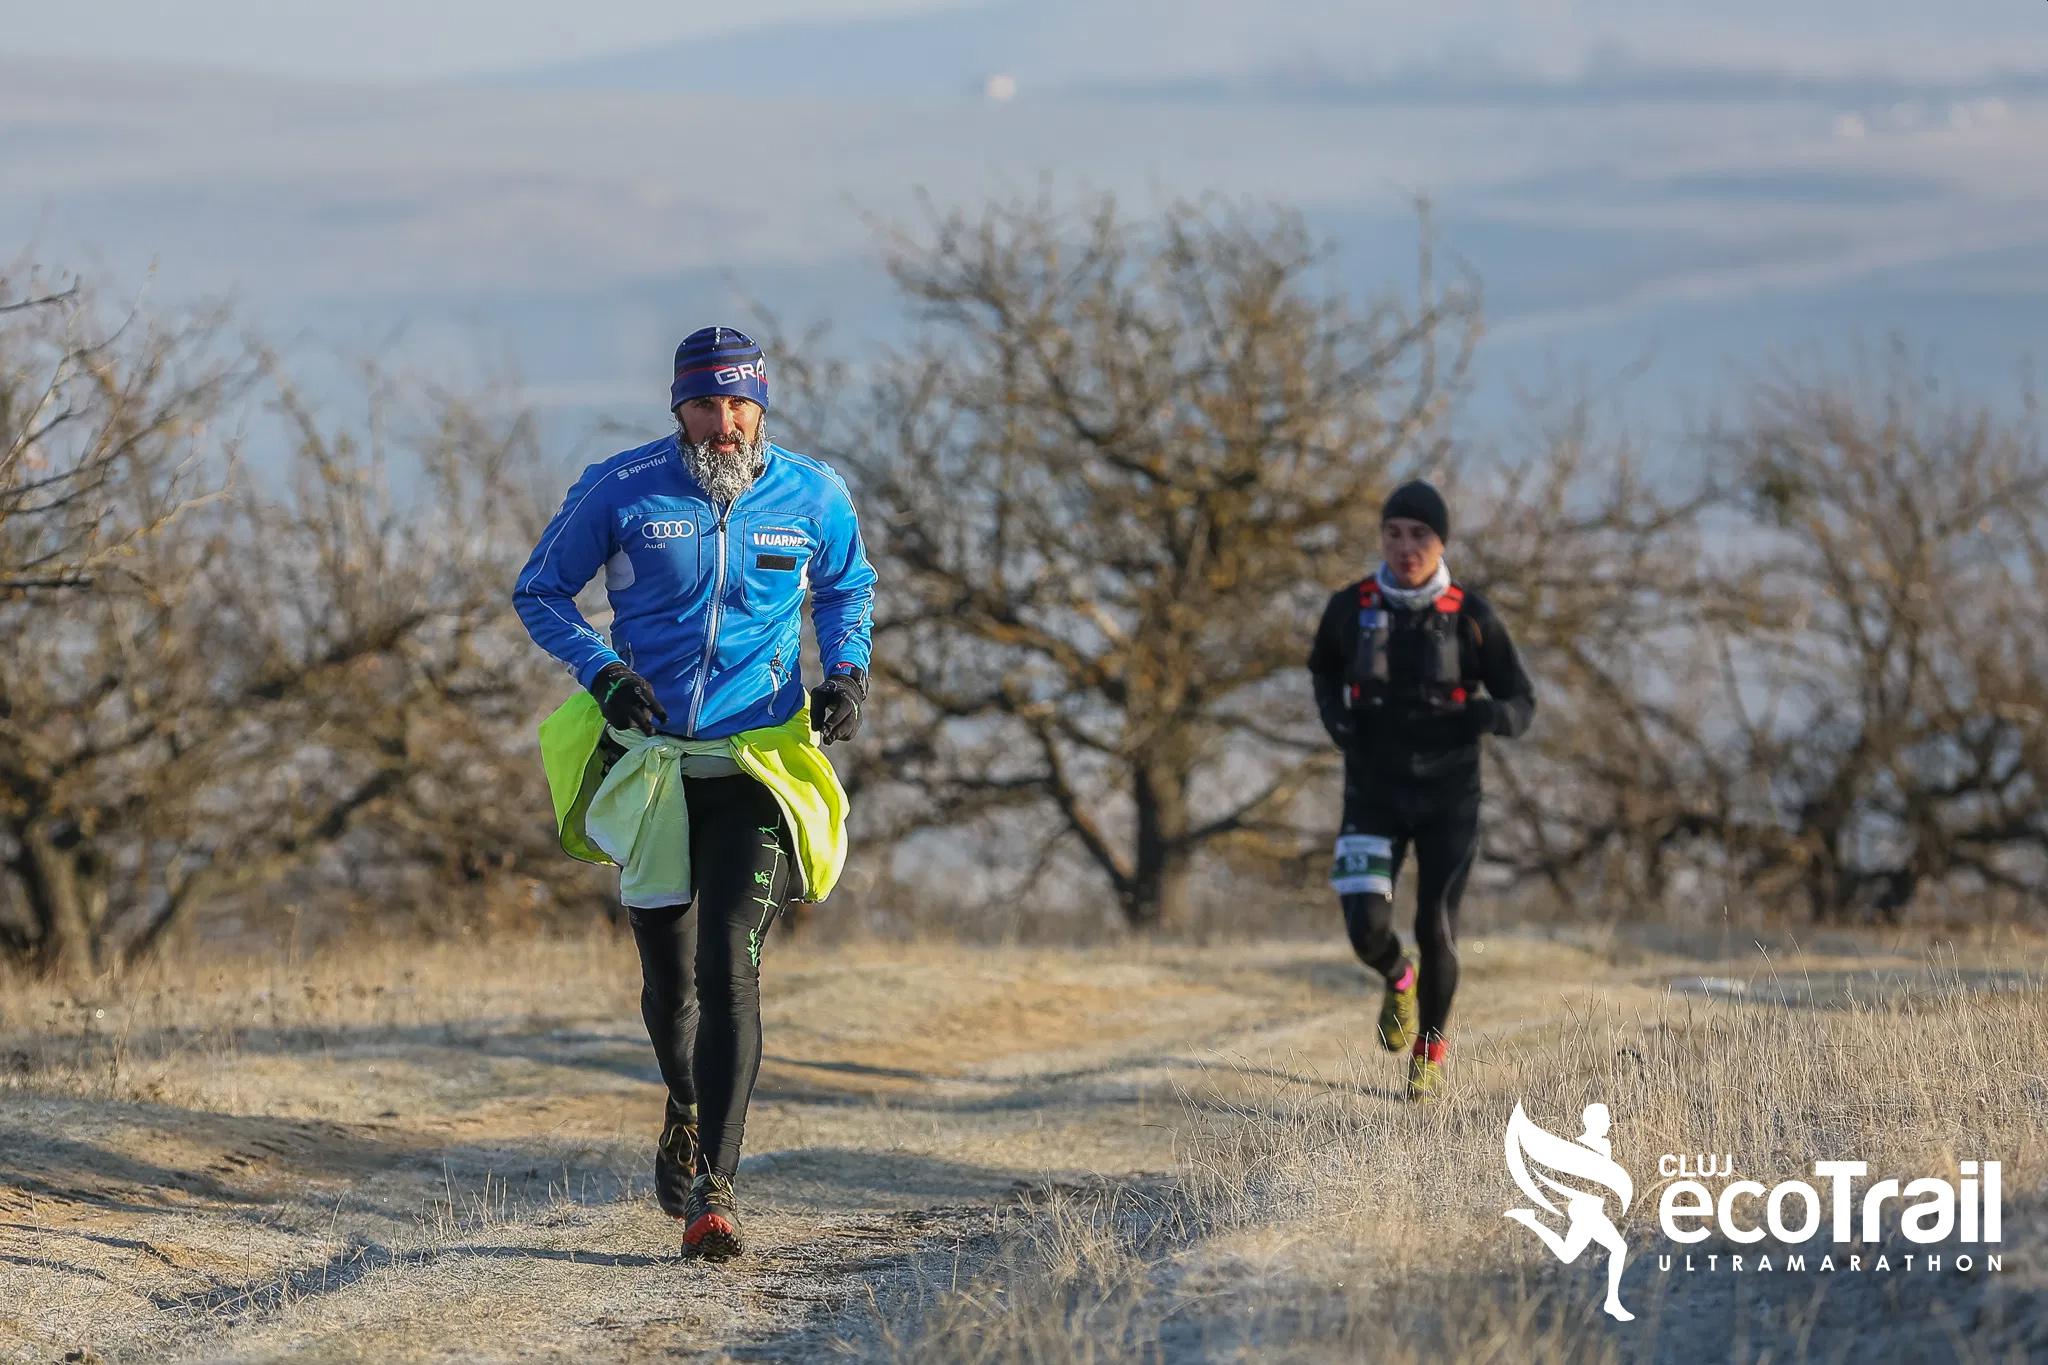 Cluj EcoTrail Ultramarathon 2020